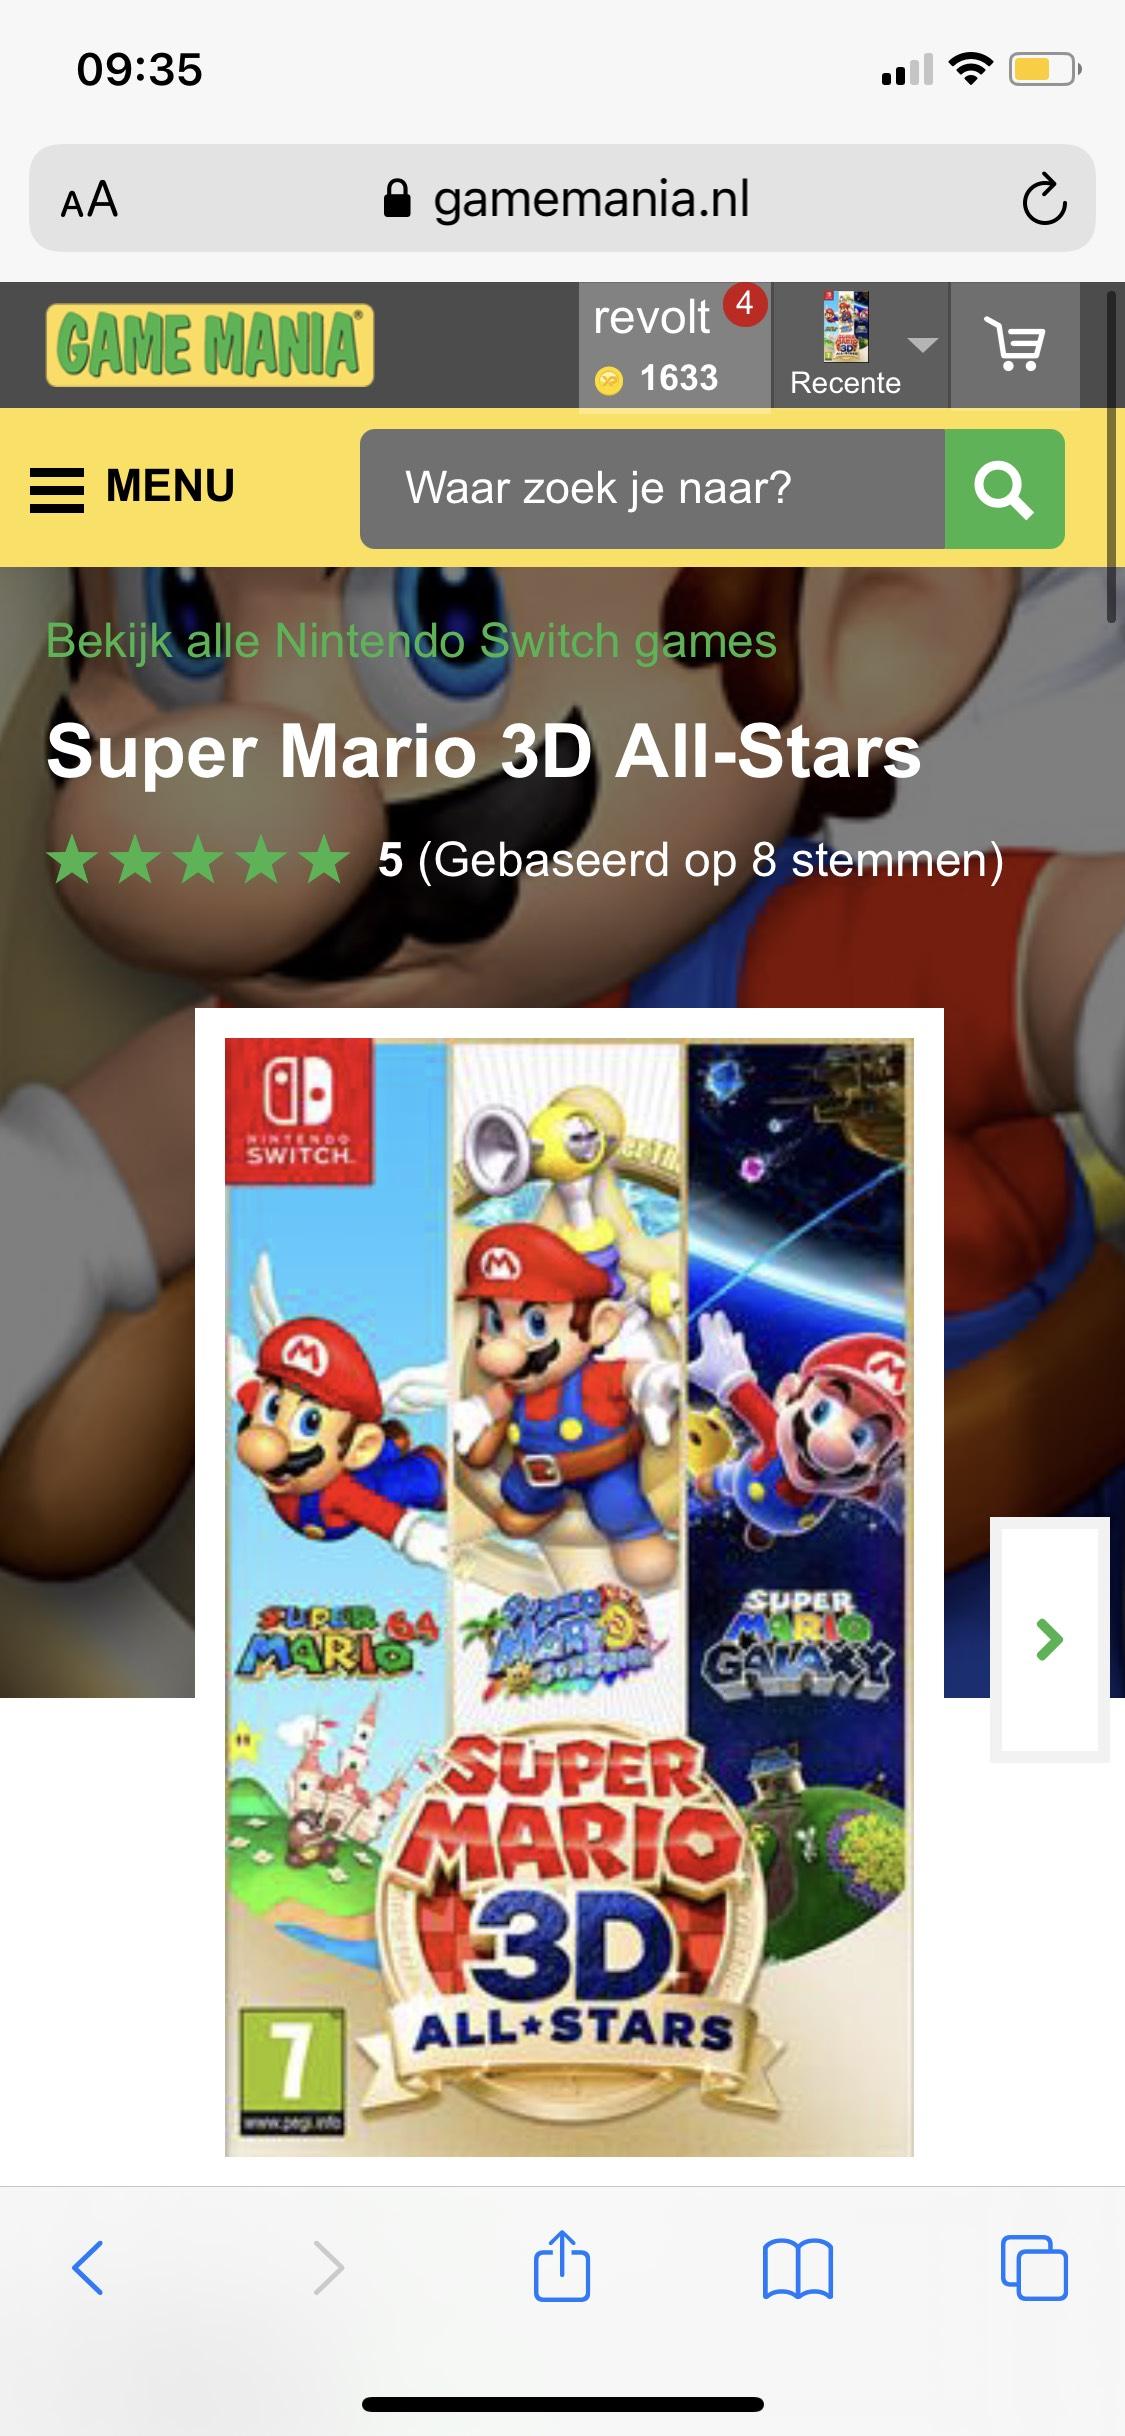 [GAME MANIA] Super Mario 3D All Stars